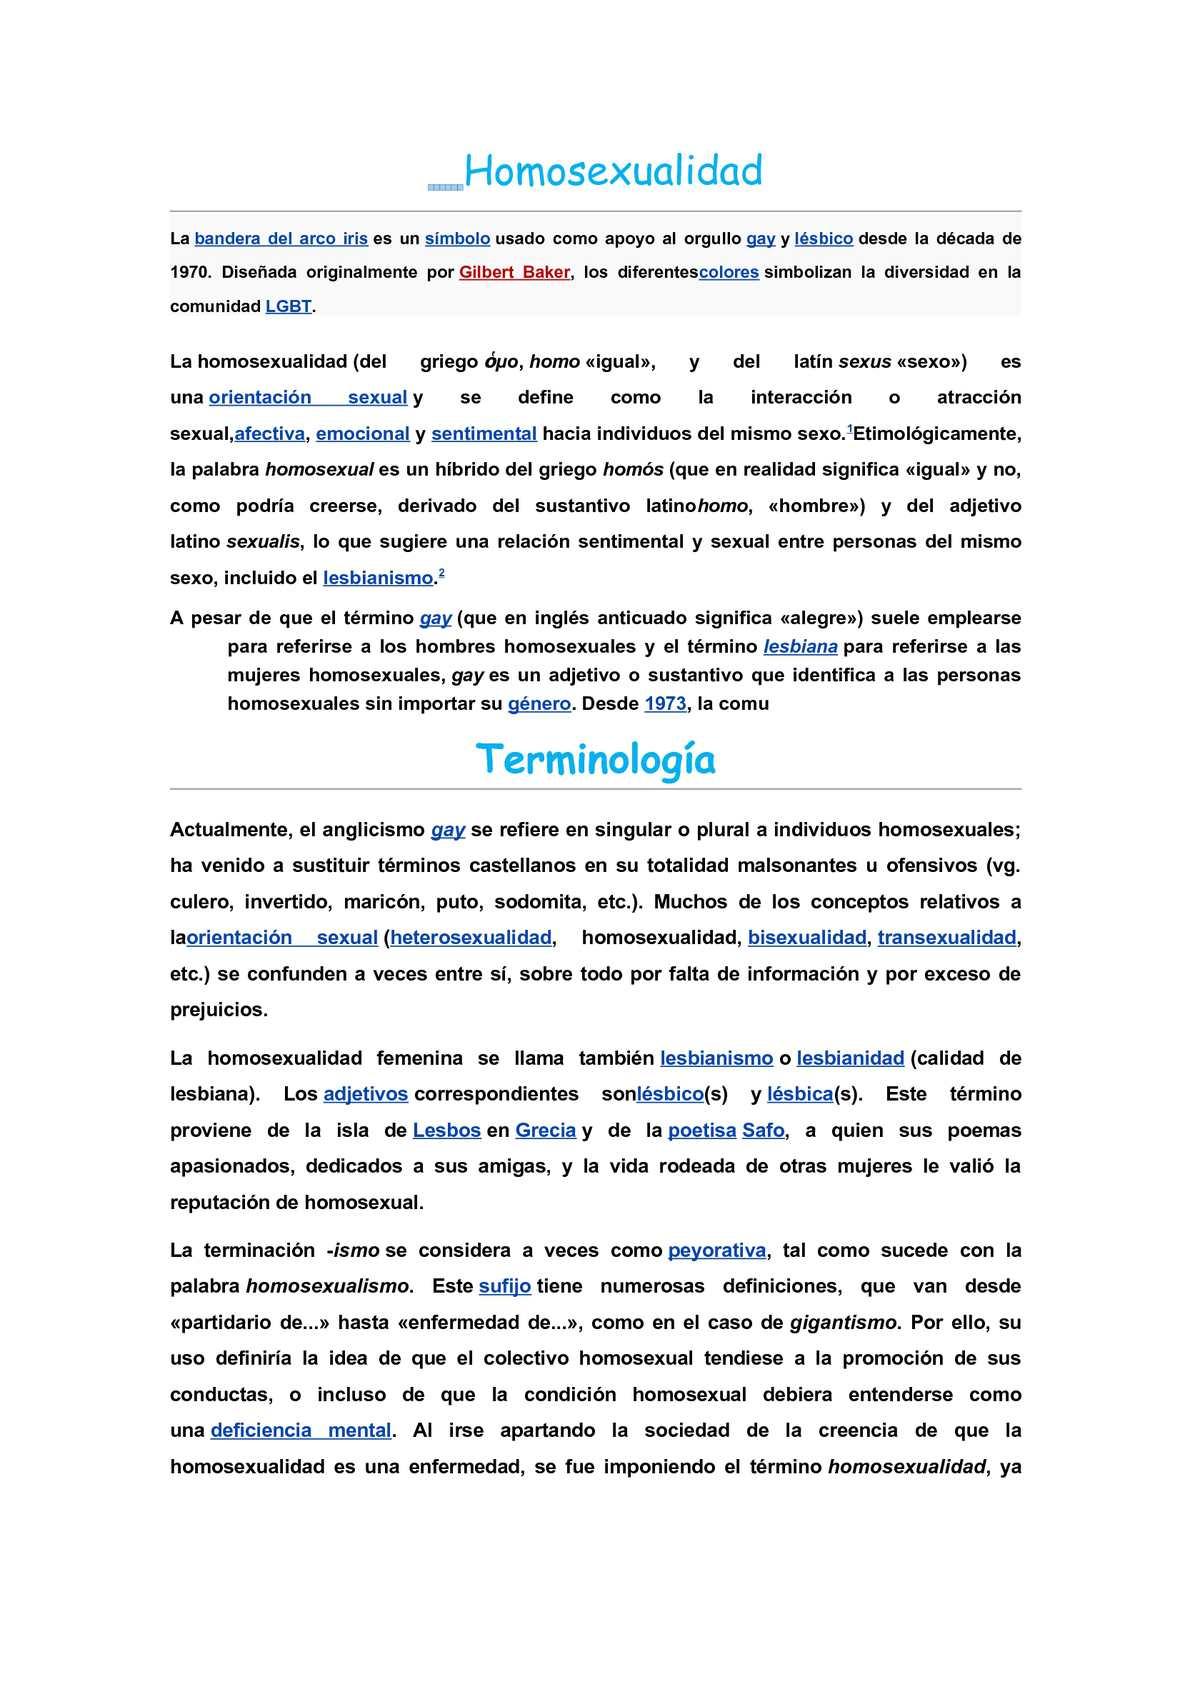 Bisexual definicion etimologica